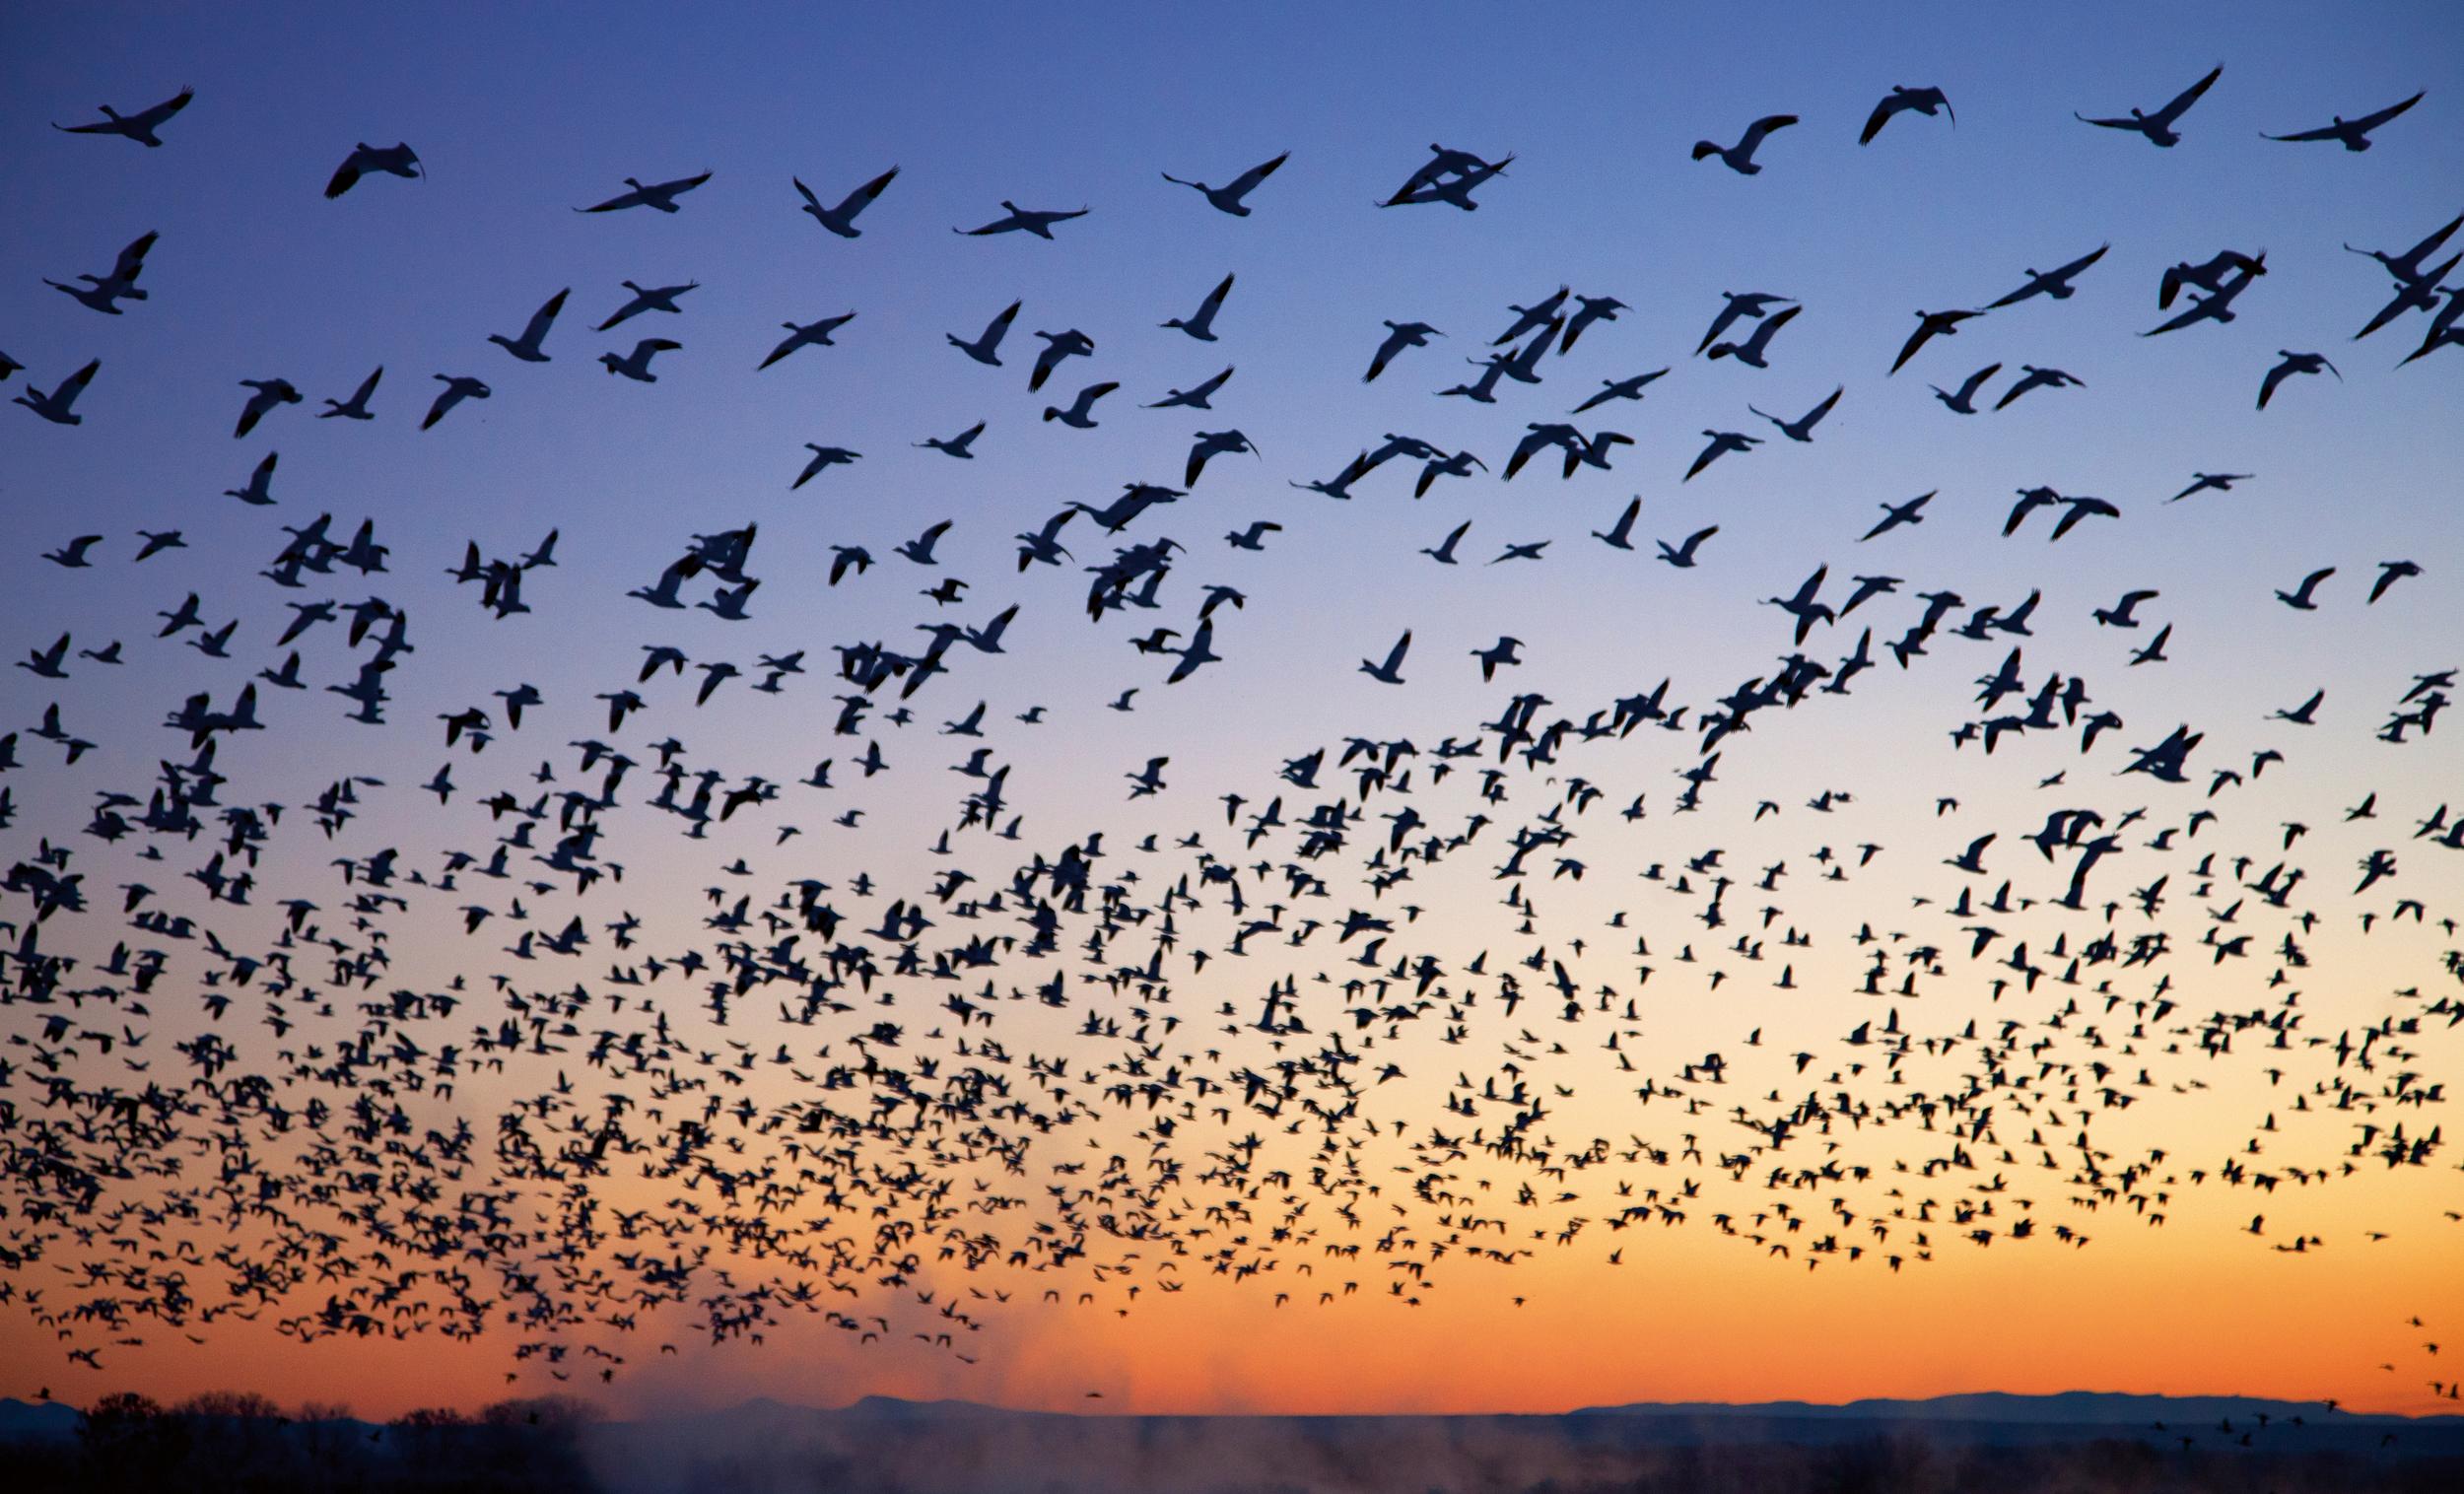 Rick Sammon's Birds026.jpg